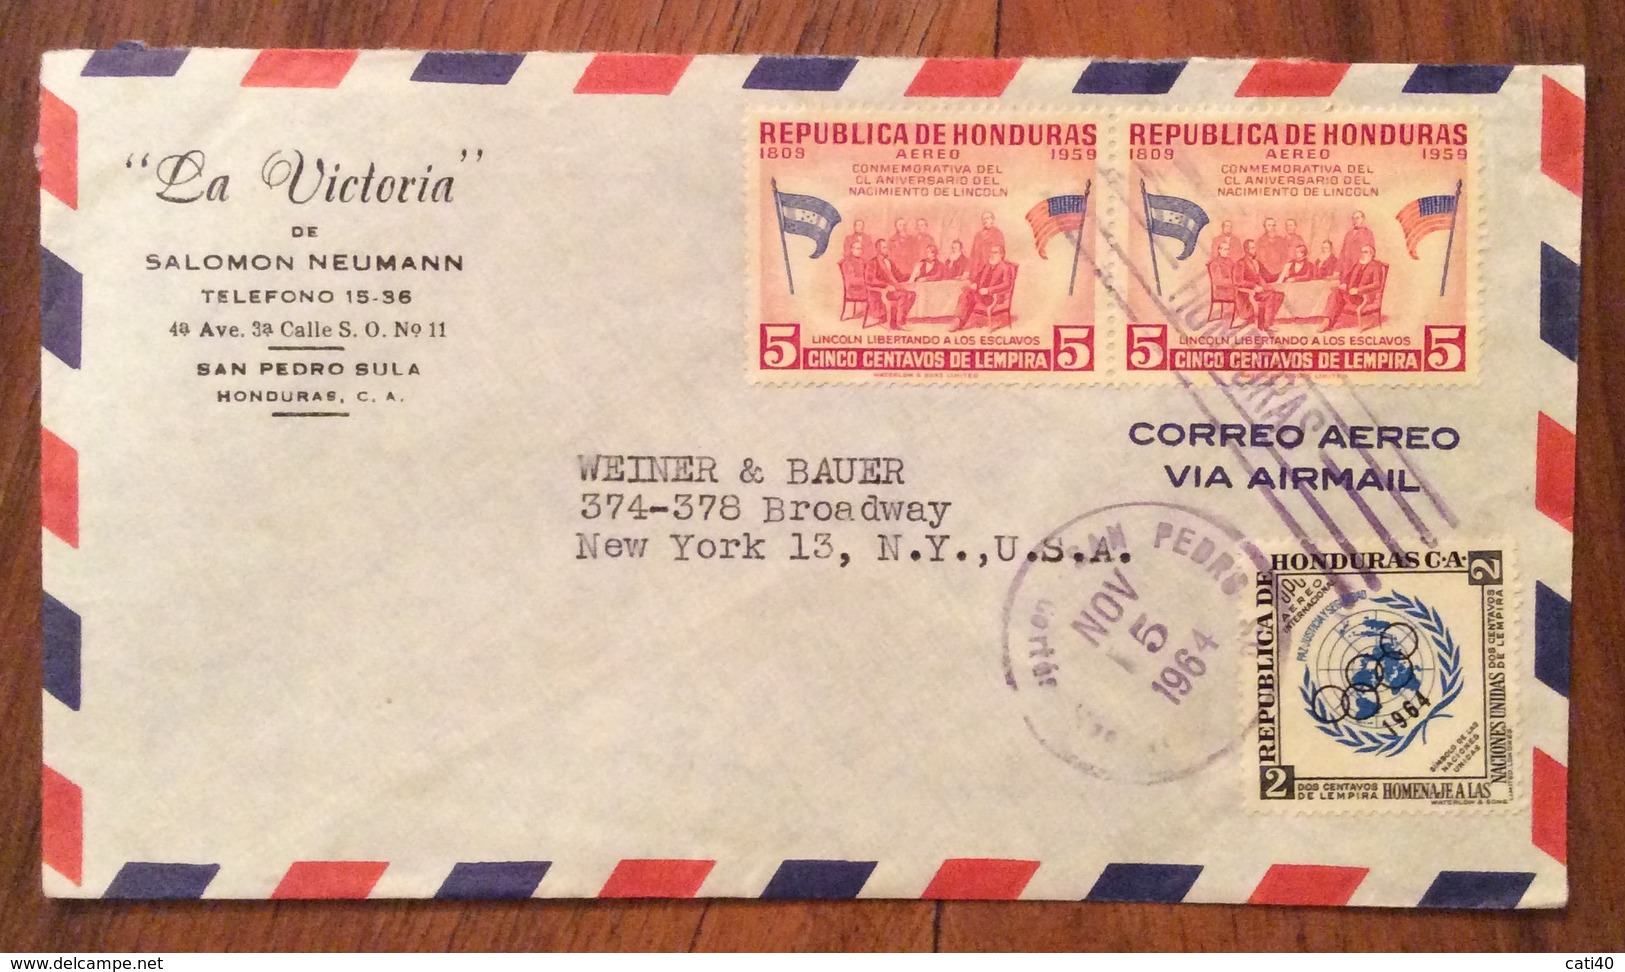 POSTA AEREA  PAR AVION  HONDURAS  U.S.A  FROM SAN PEDRO SULA  TO NEW YORK   THE  15/11/64 - Honduras